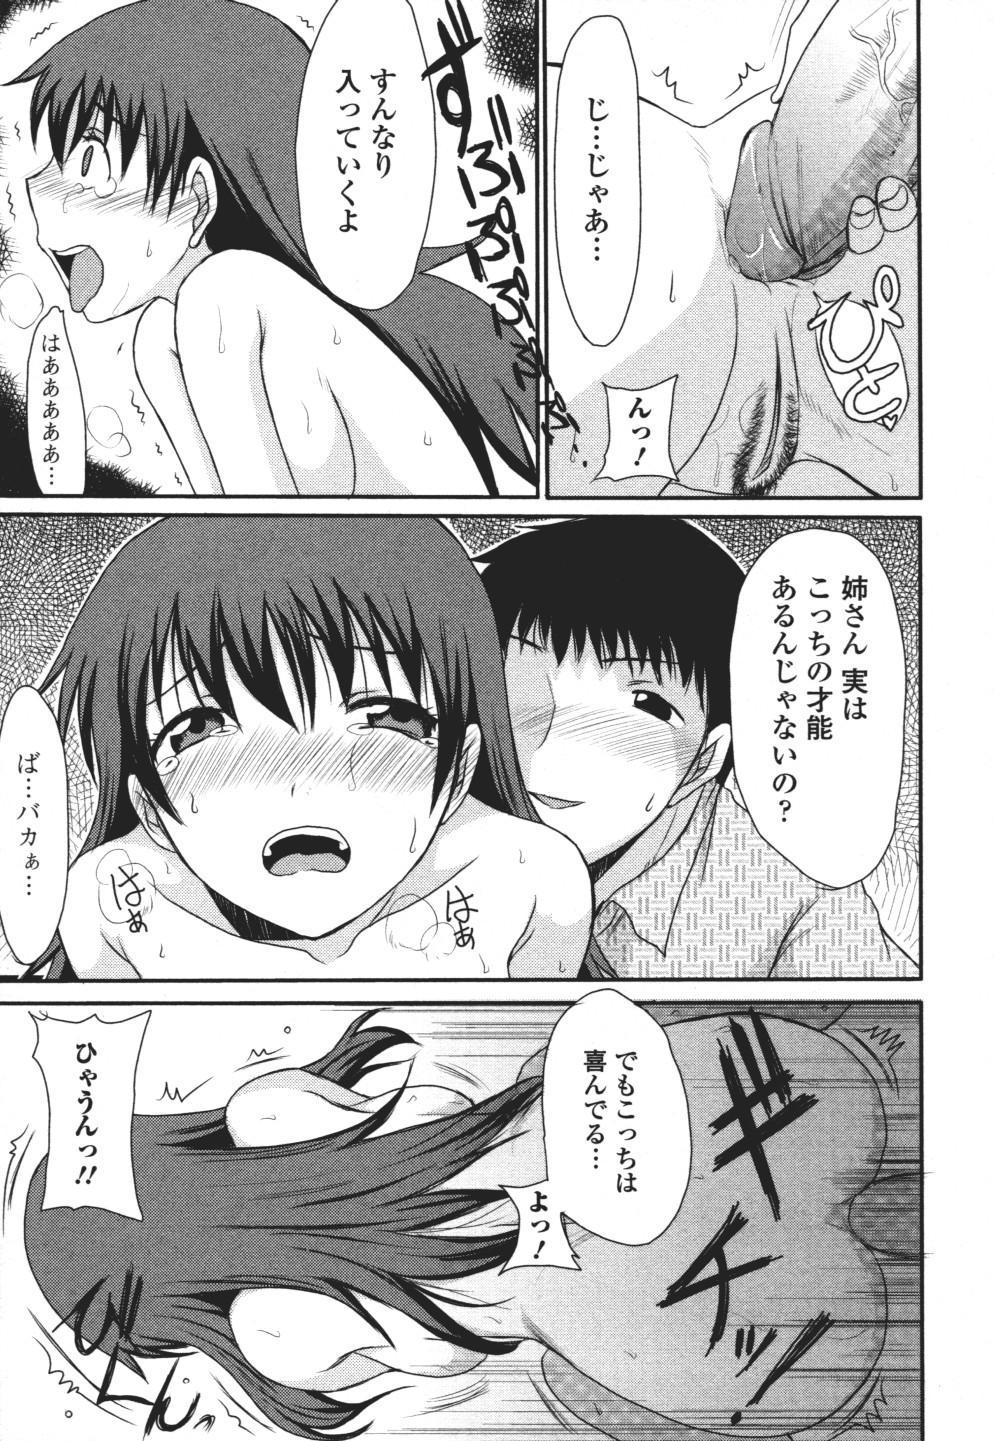 Nozoite wa Ikenai 3 - Do Not Peep! 3 129